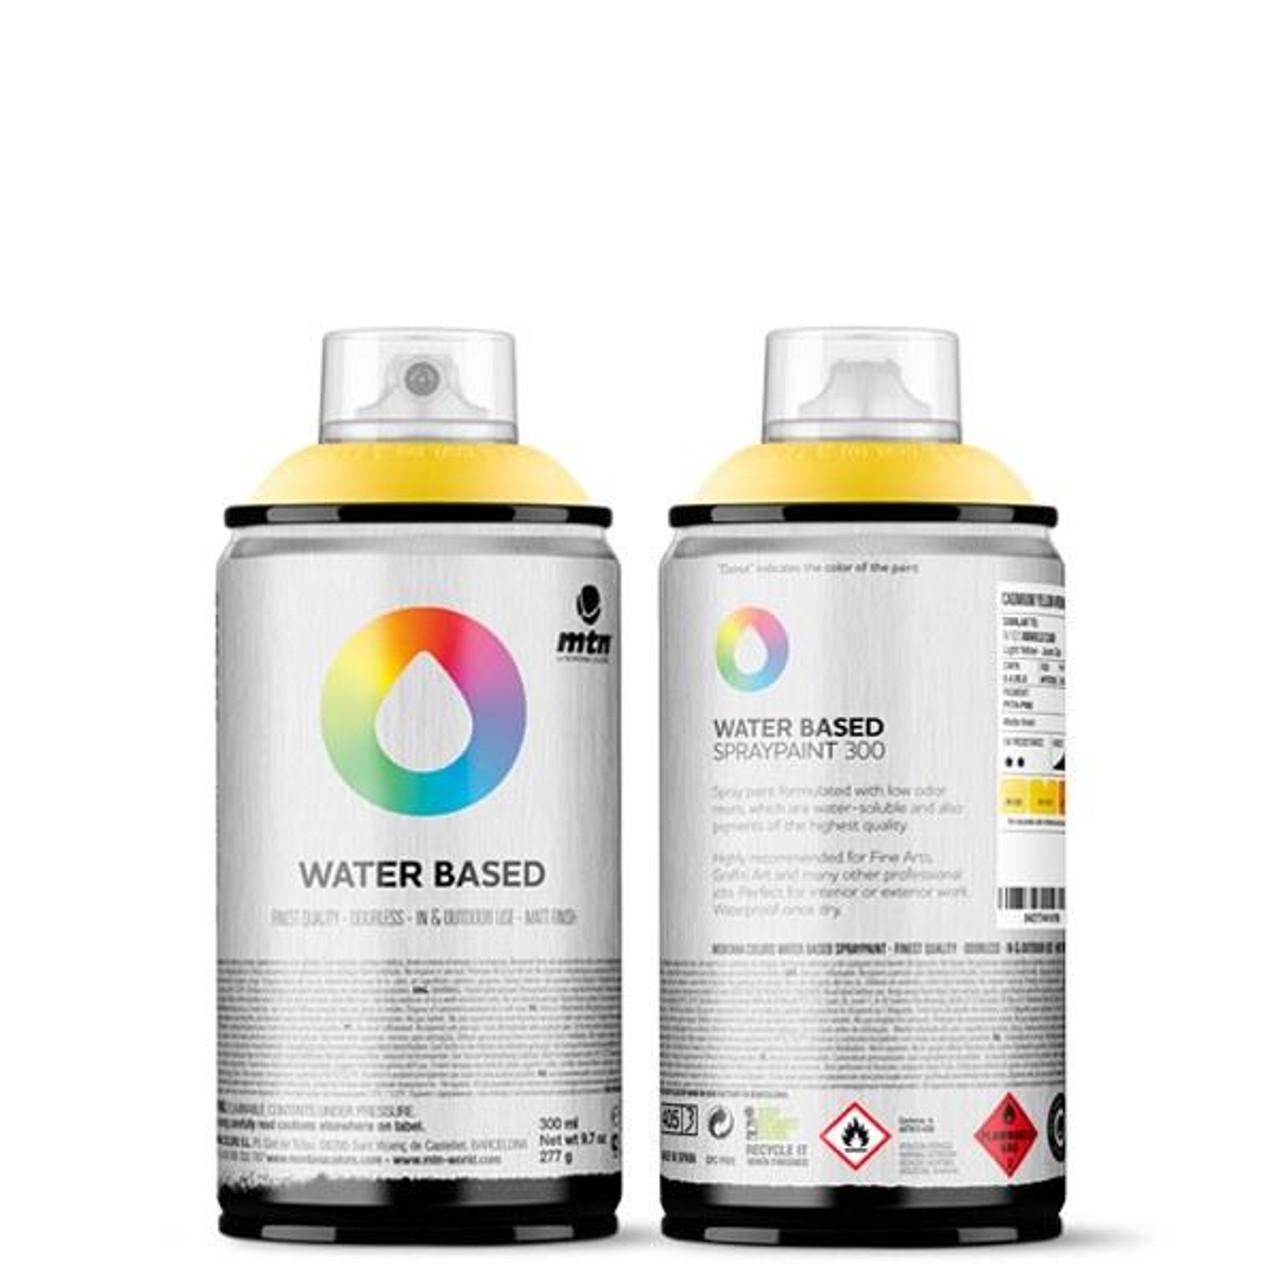 MTN Water Based